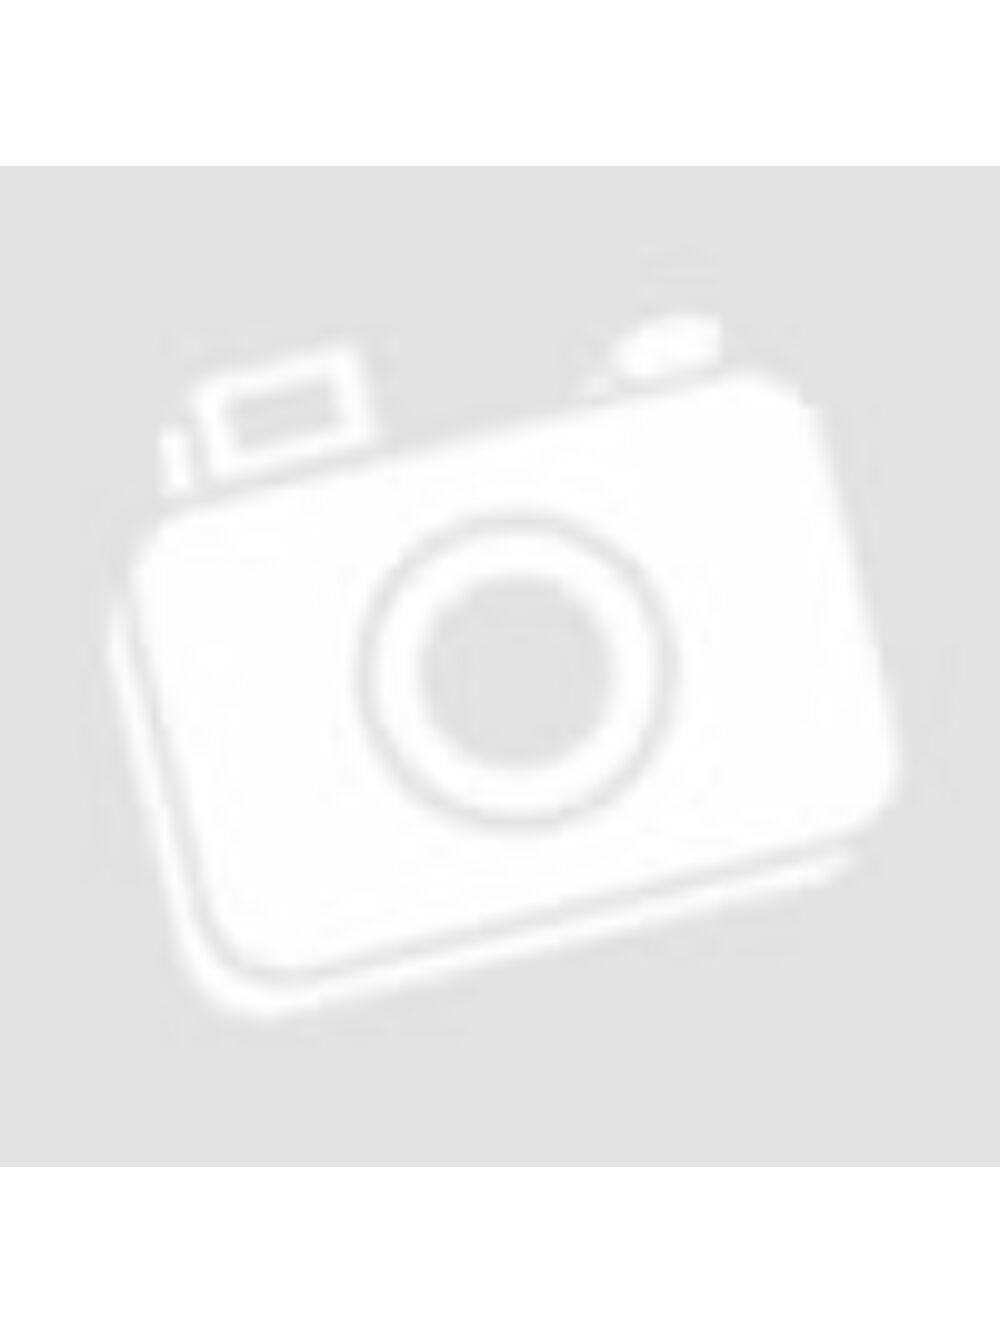 Öntapi polyresin zöld-sárga nyúl